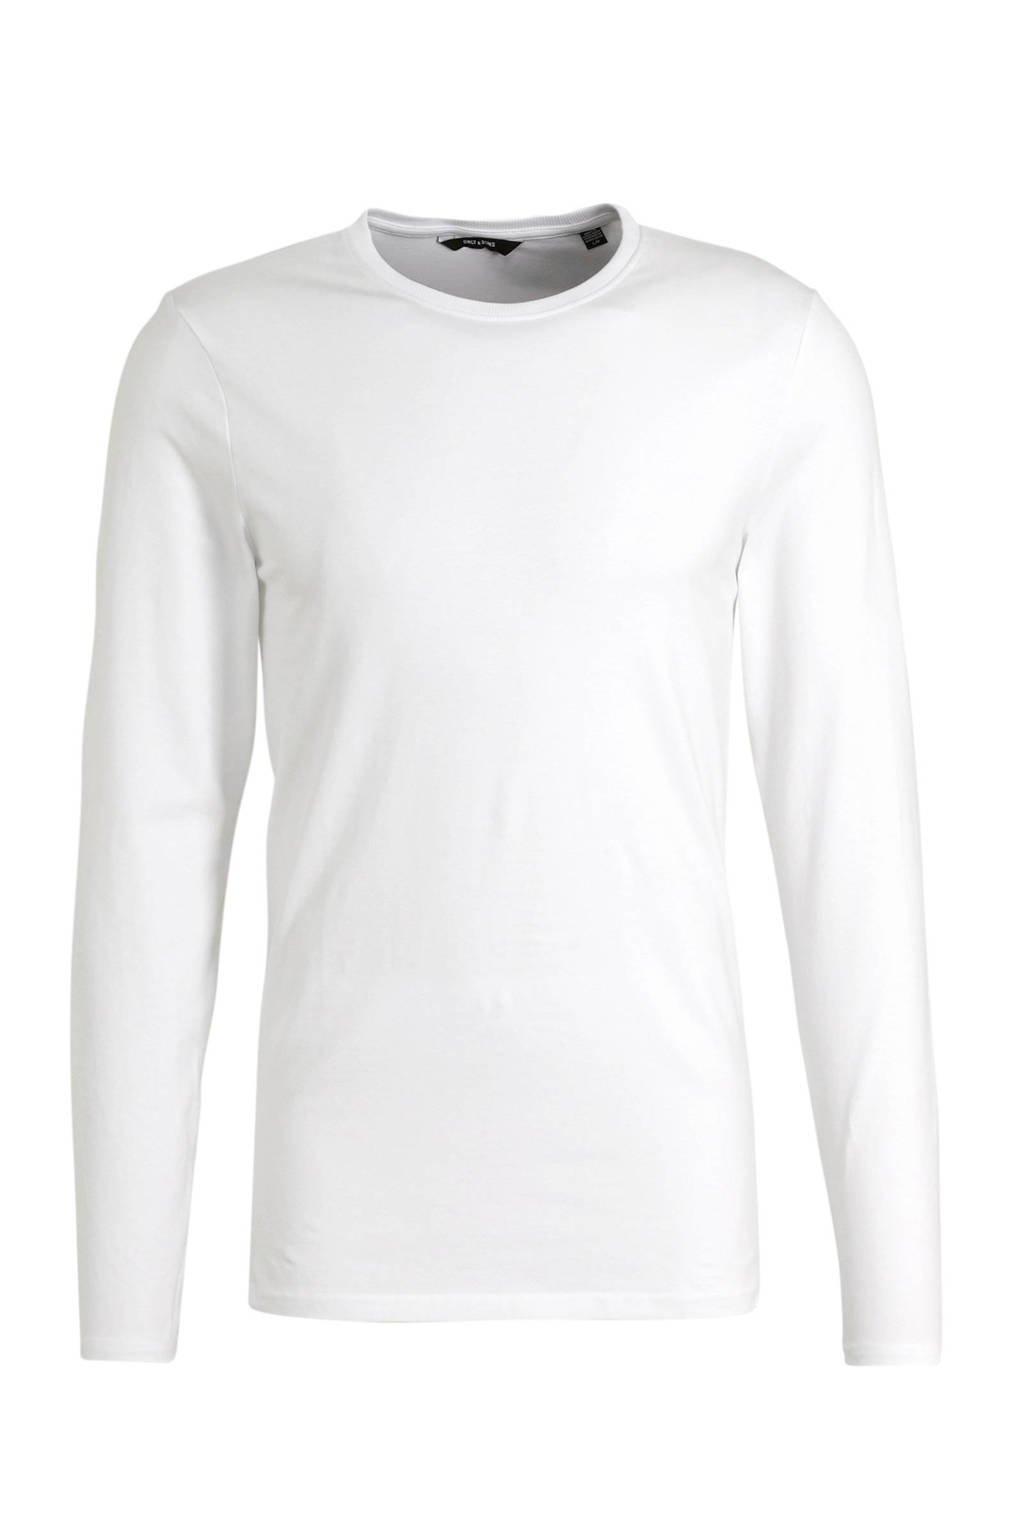 ONLY & SONS T-shirt - (set van 2), Wit